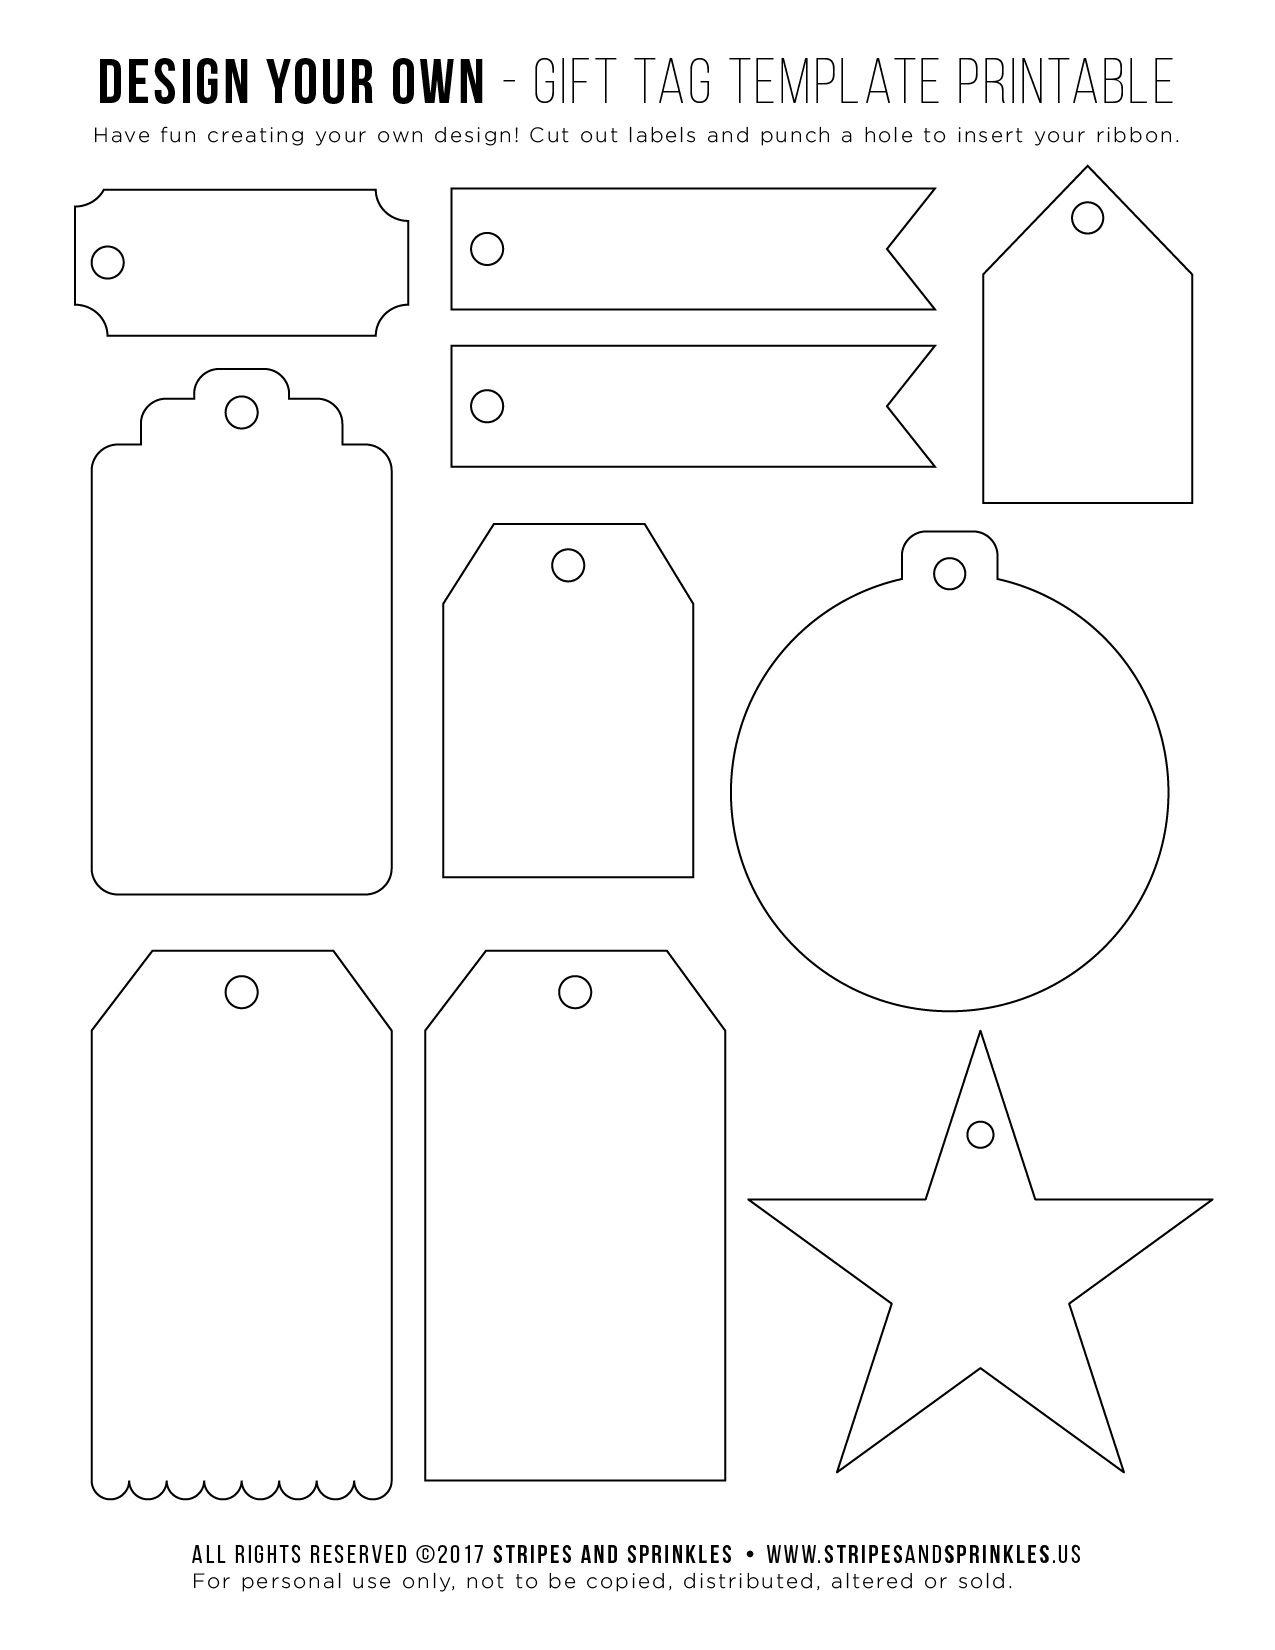 Download Free Printable   باترونات ثيمات   Free Label Templates, Tag - Free Printable Tags Templates